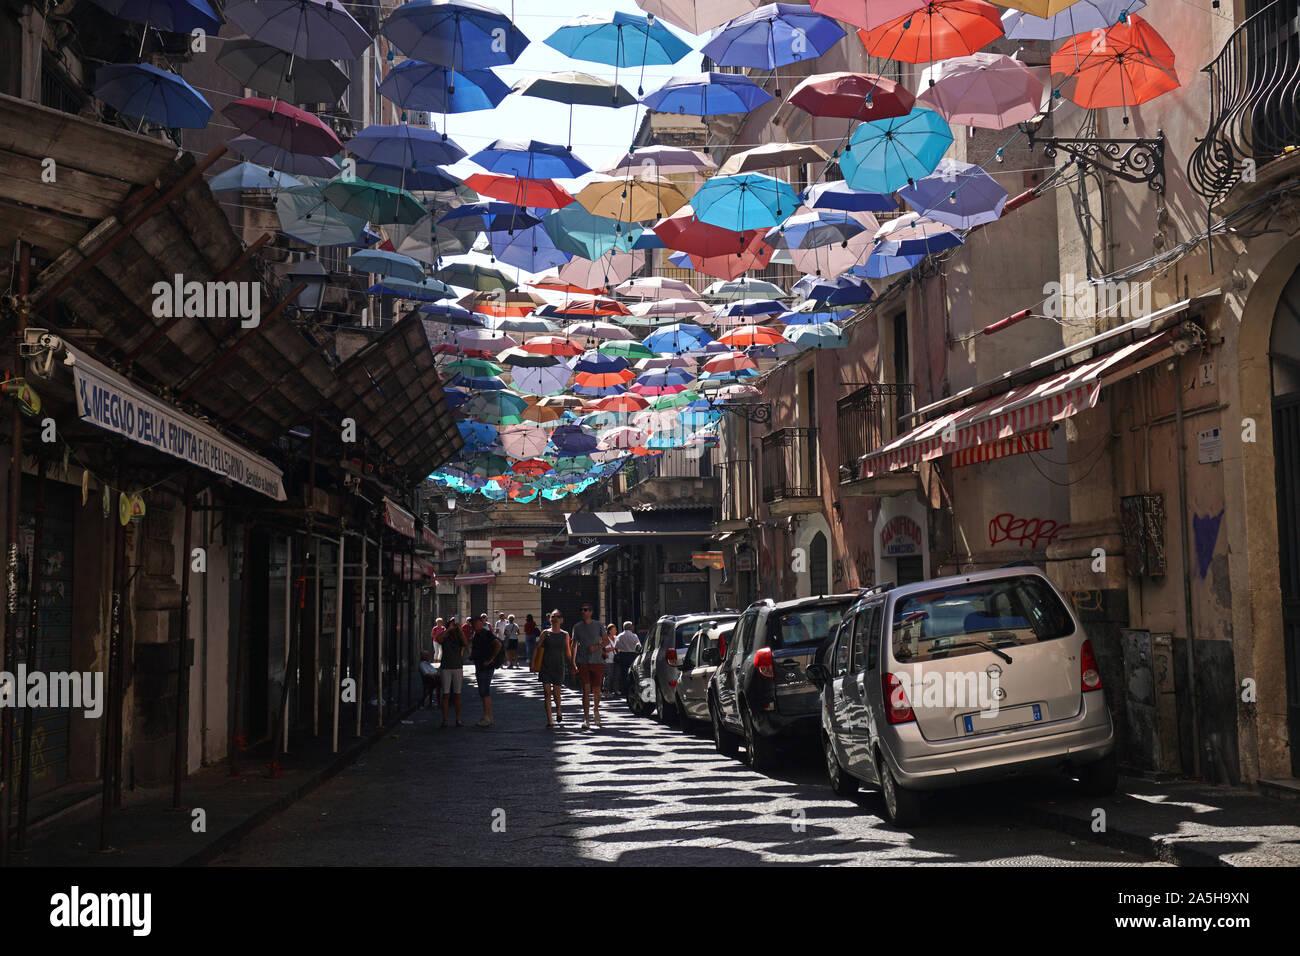 Die bunte Regenschirme der Regenschirm Sky Projekt in der Via Cisira und Via Pardo, Catania, Sicly, Italien, Stockfoto